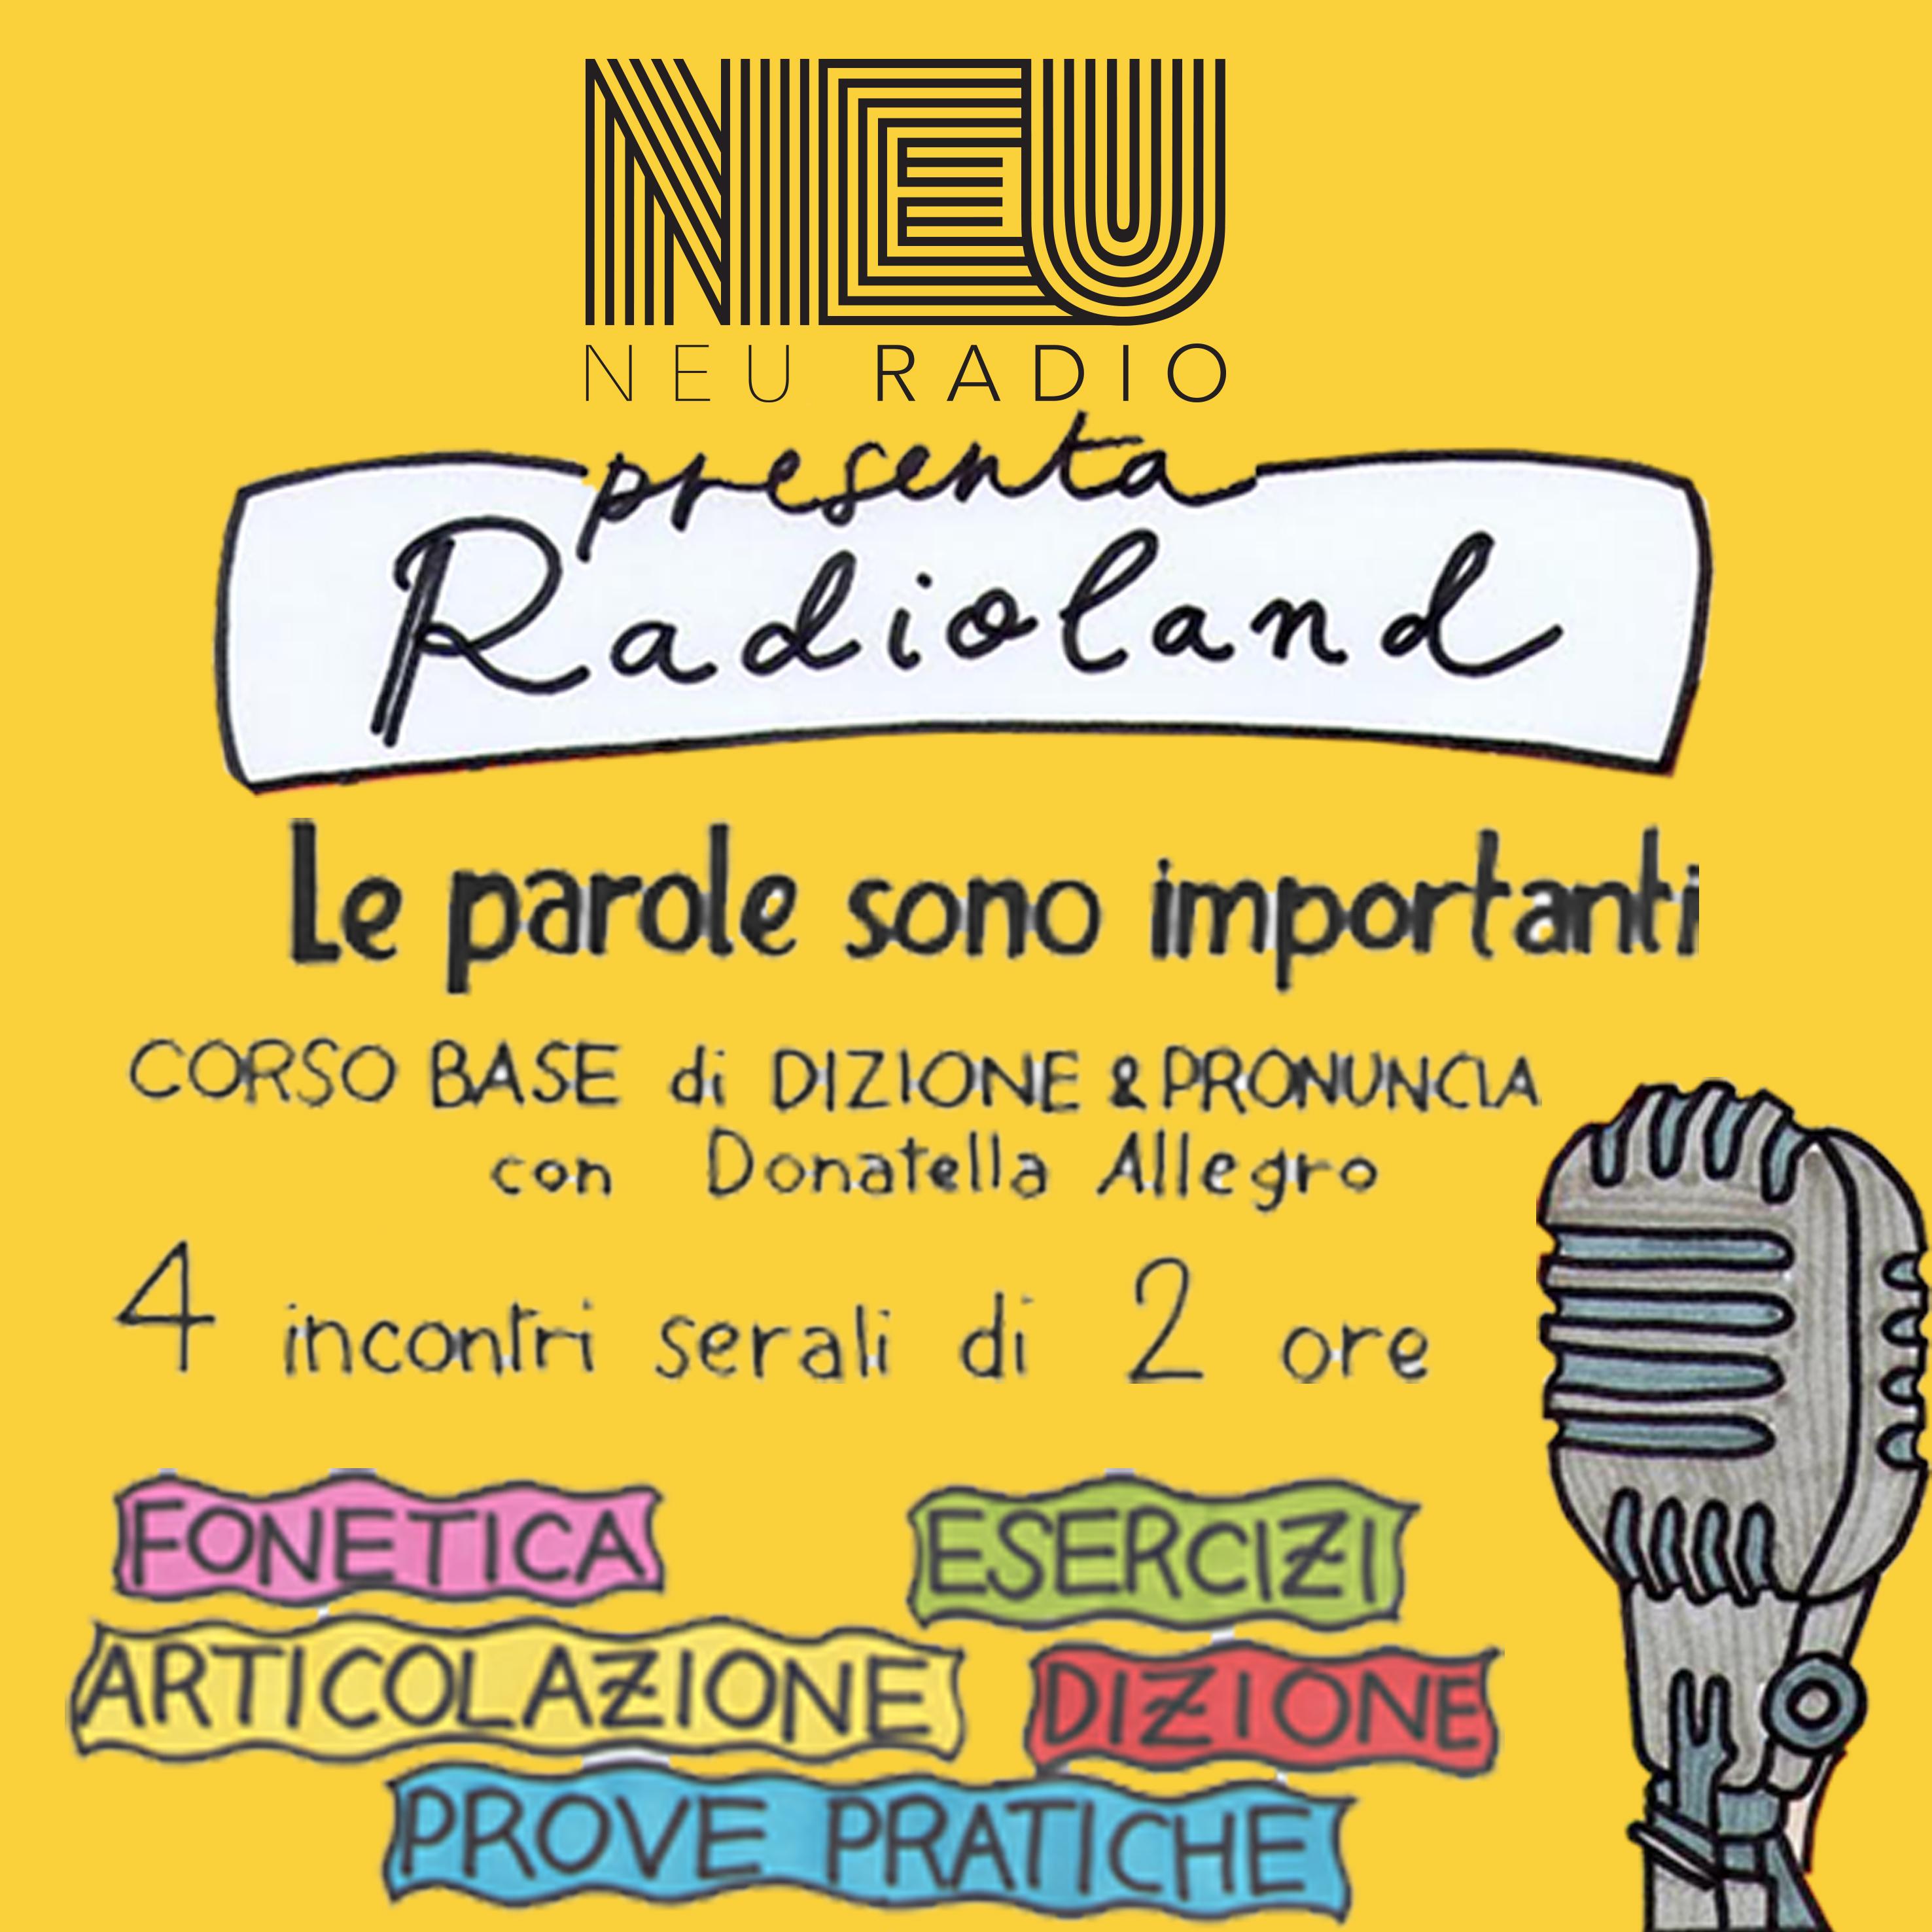 Radioland – I step: Le parole sono importanti